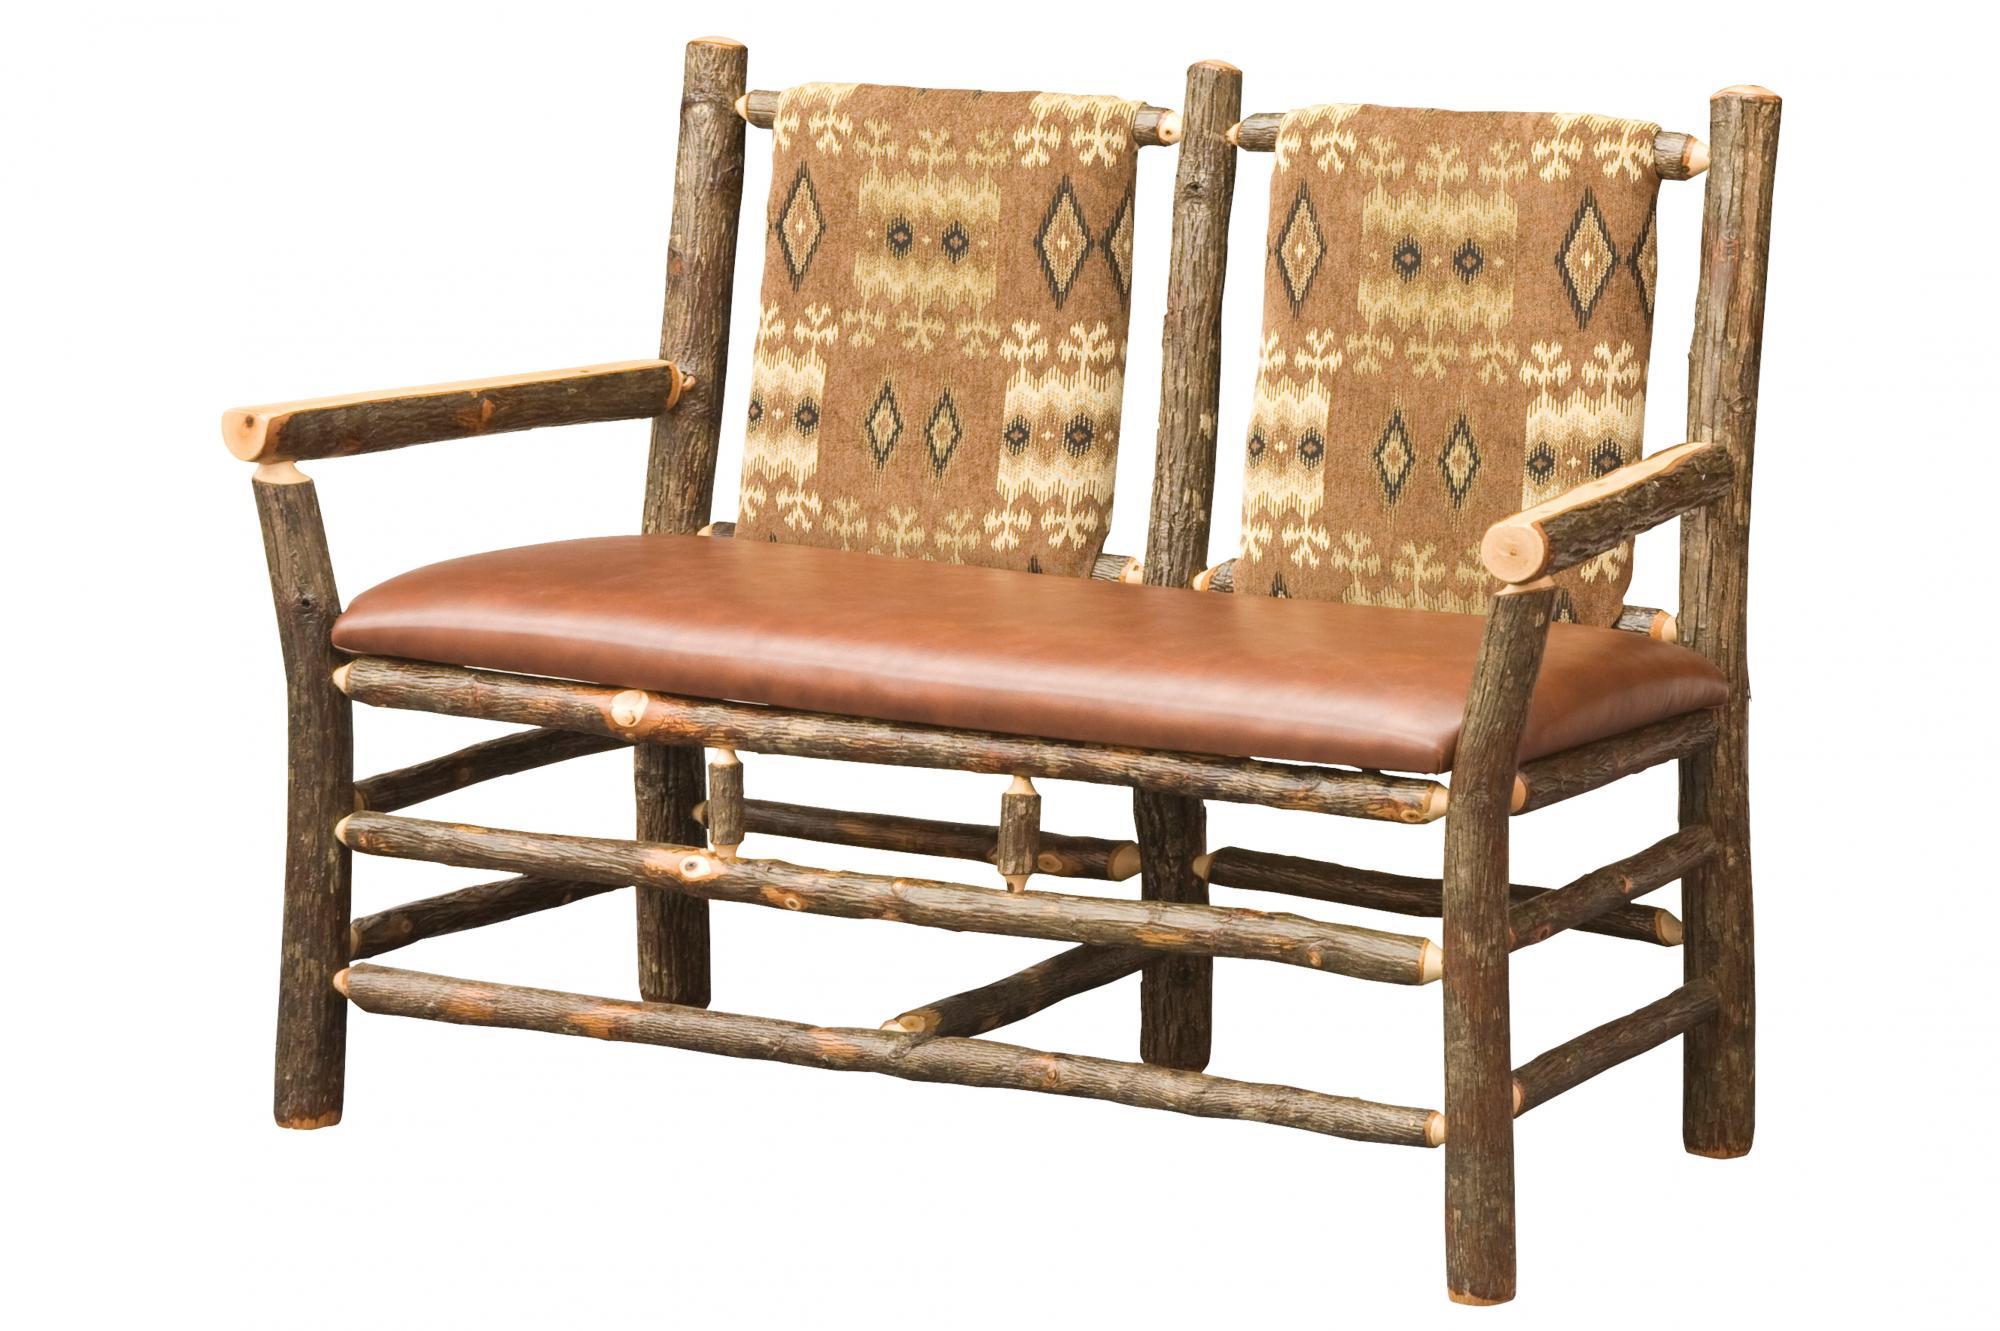 Settee Amish Furniture Store Mankato MN